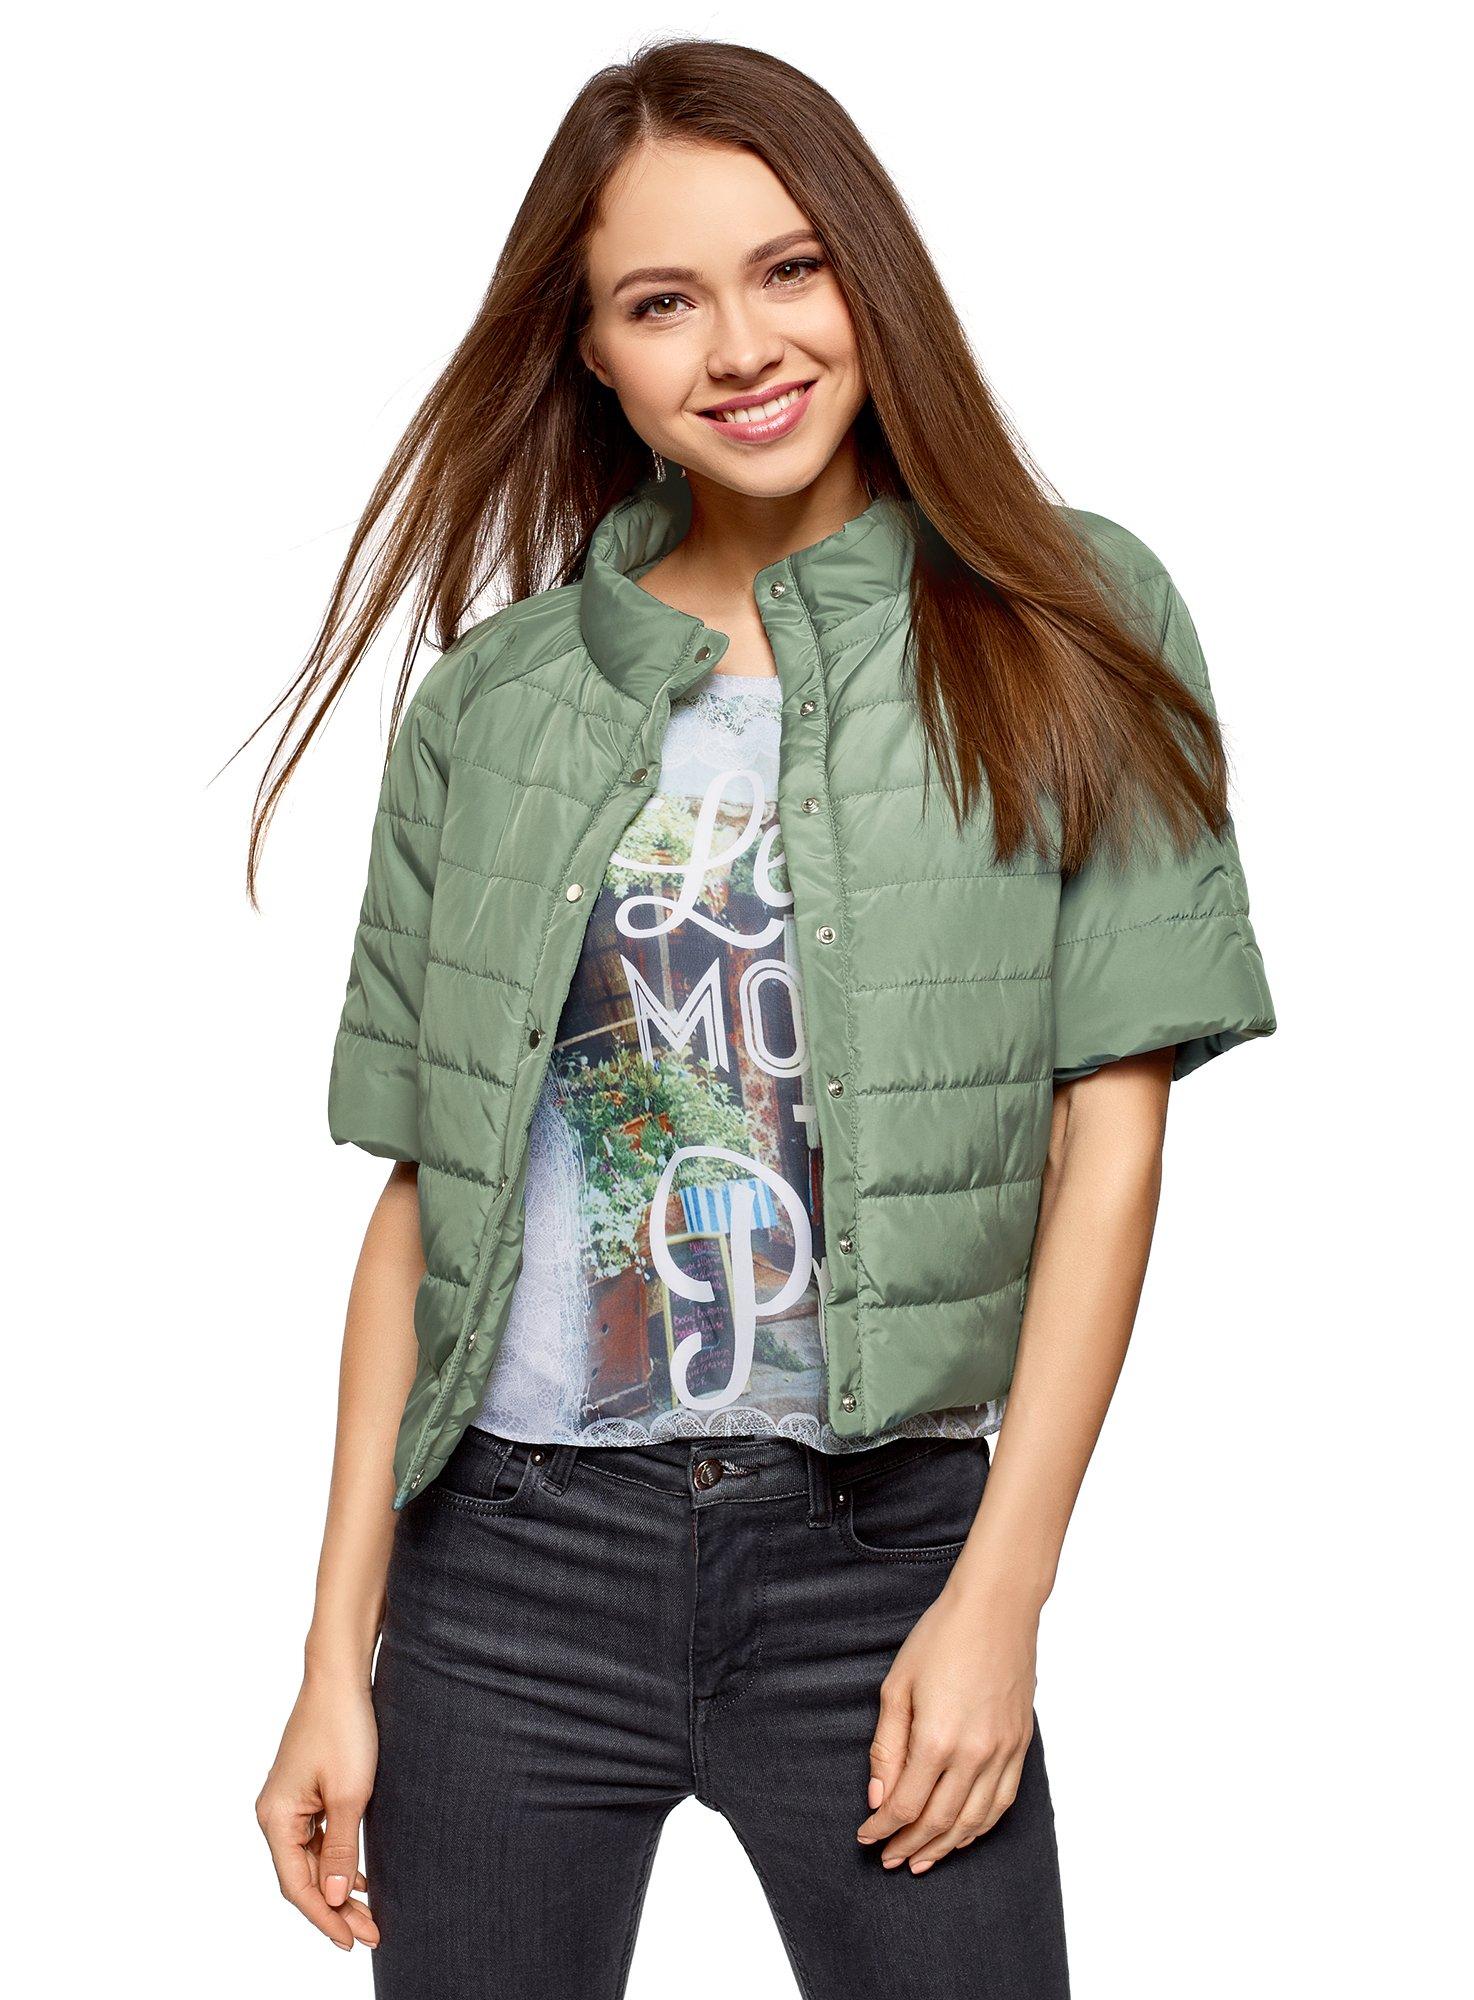 oodji Ultra Women's Short Sleeve Quilted Jacket, Green, 4